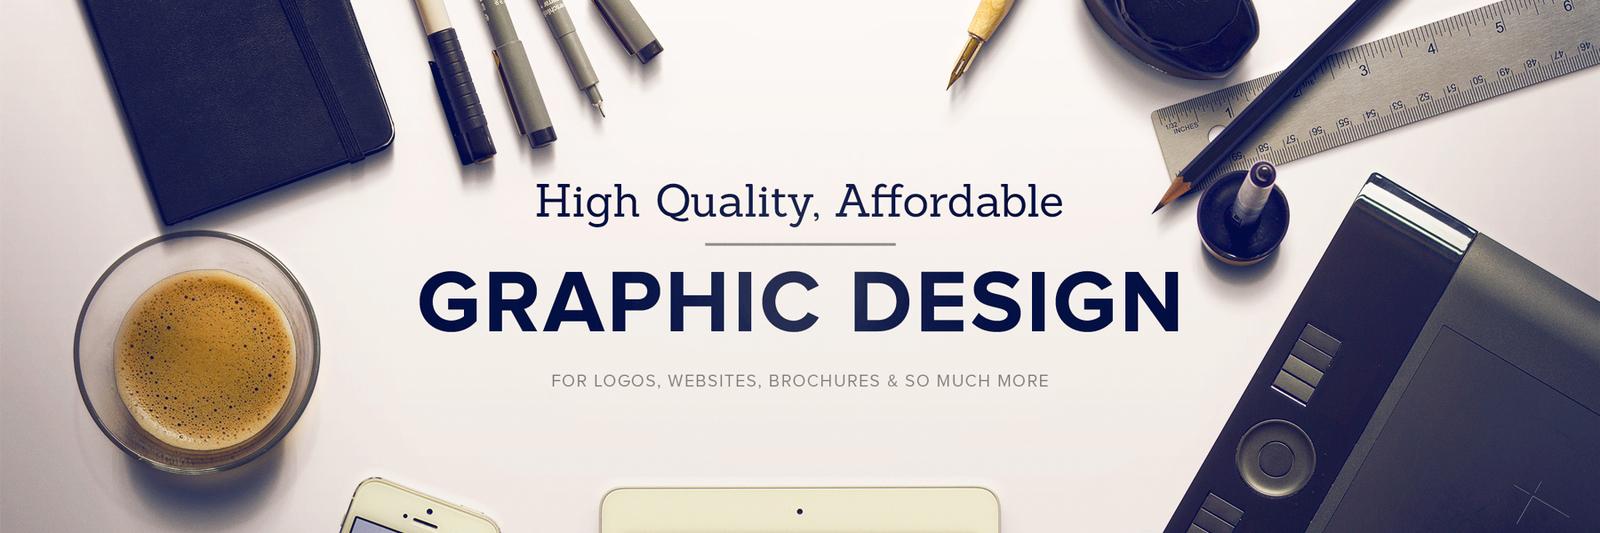 Graphic Designer in Egypt - No Poverty SDG#1